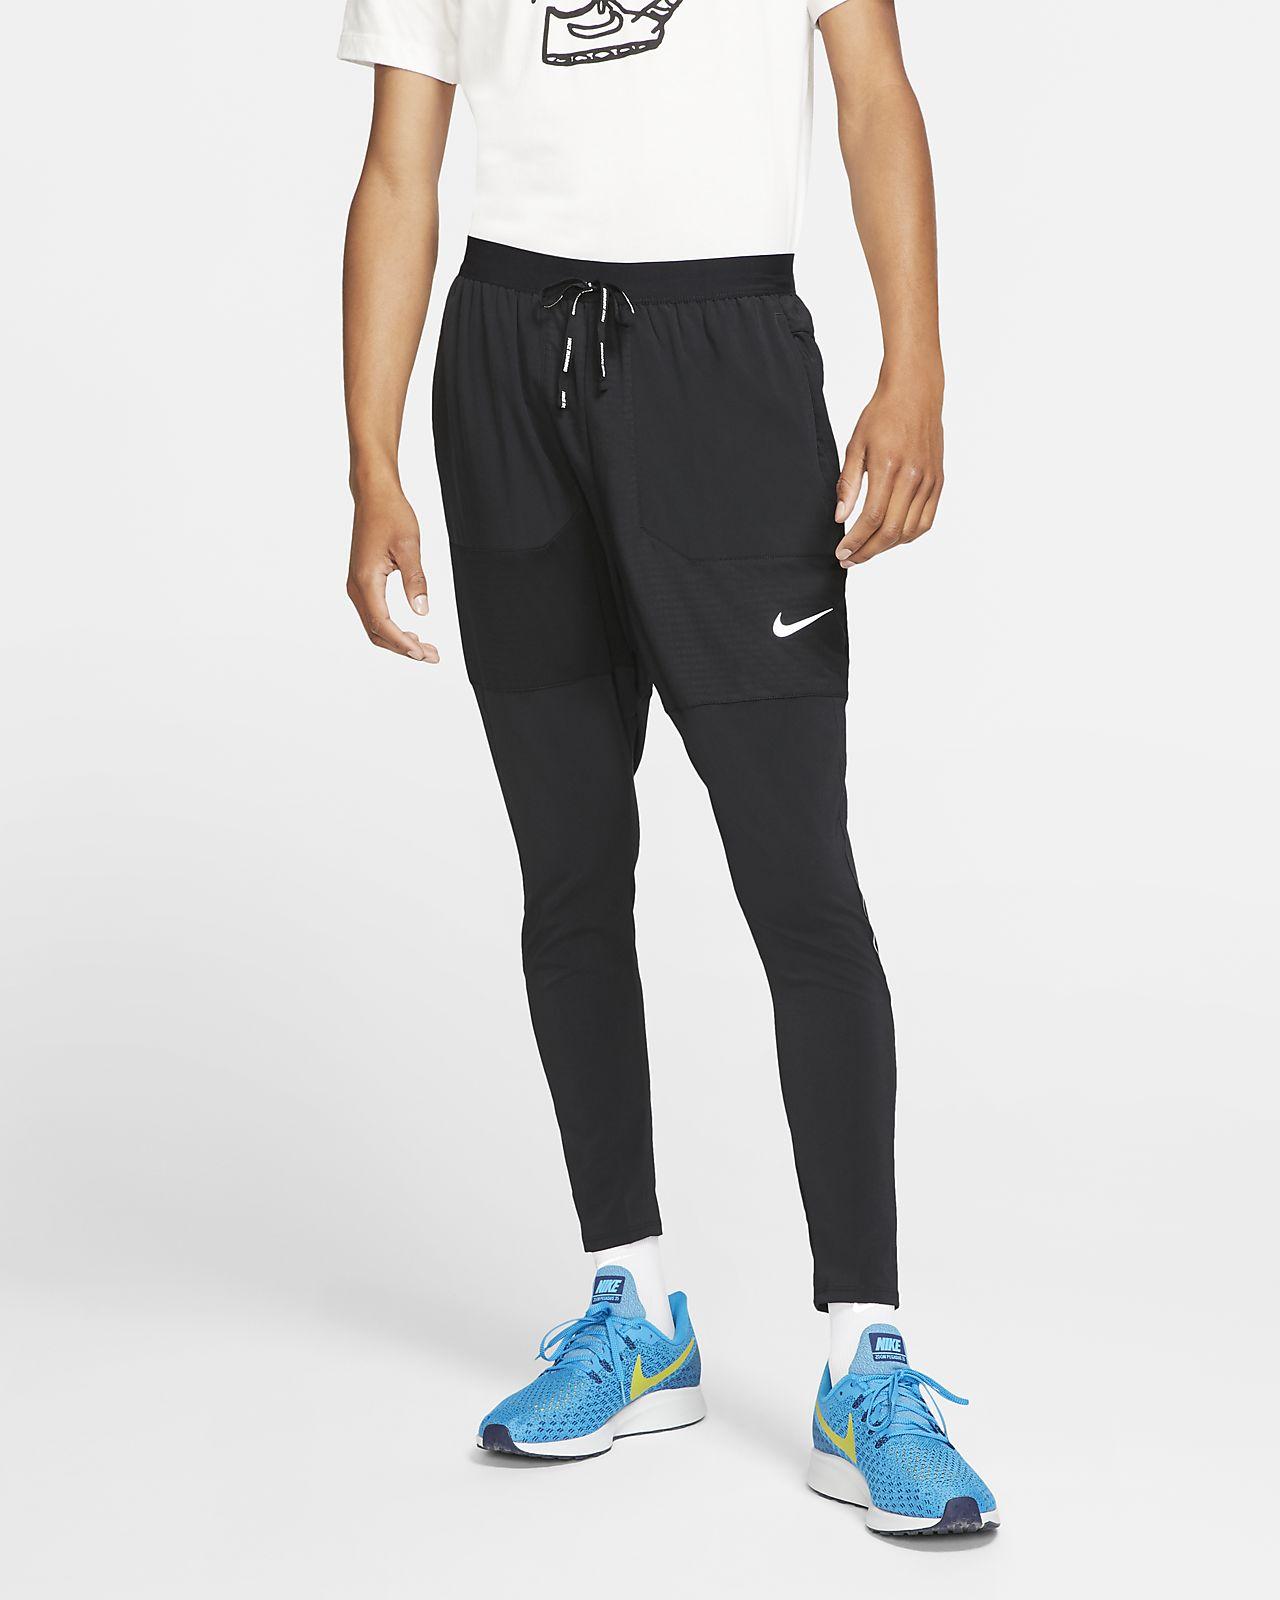 Running Phenom Nike Pour Homme De Pantalon 53R4qLAj